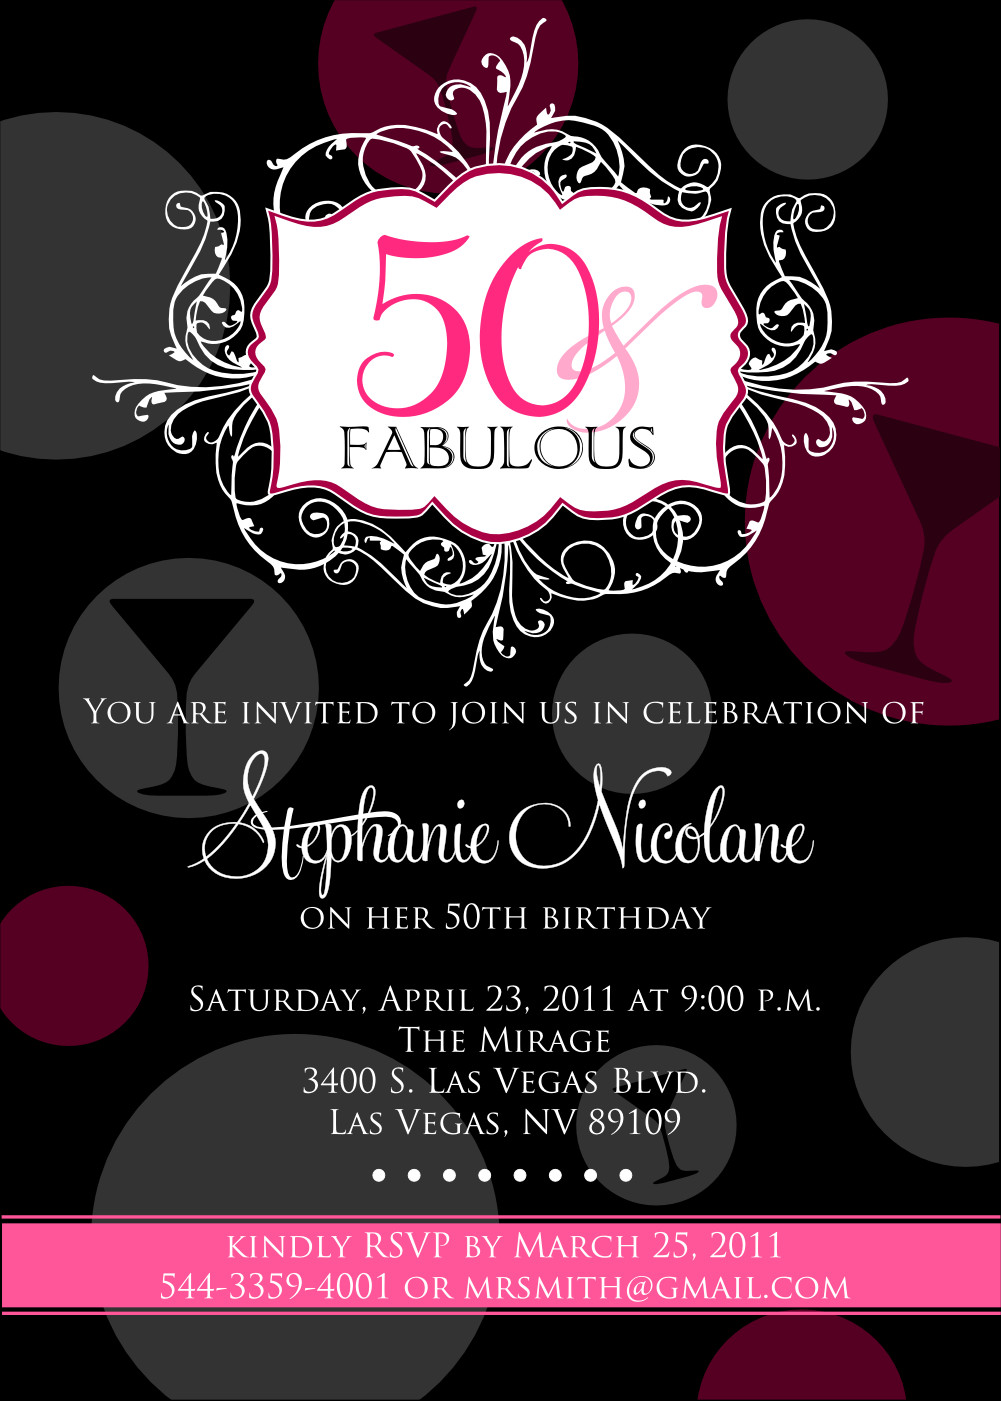 50th Birthday Invitations Templates 50th Birthday Beach Party Invitations